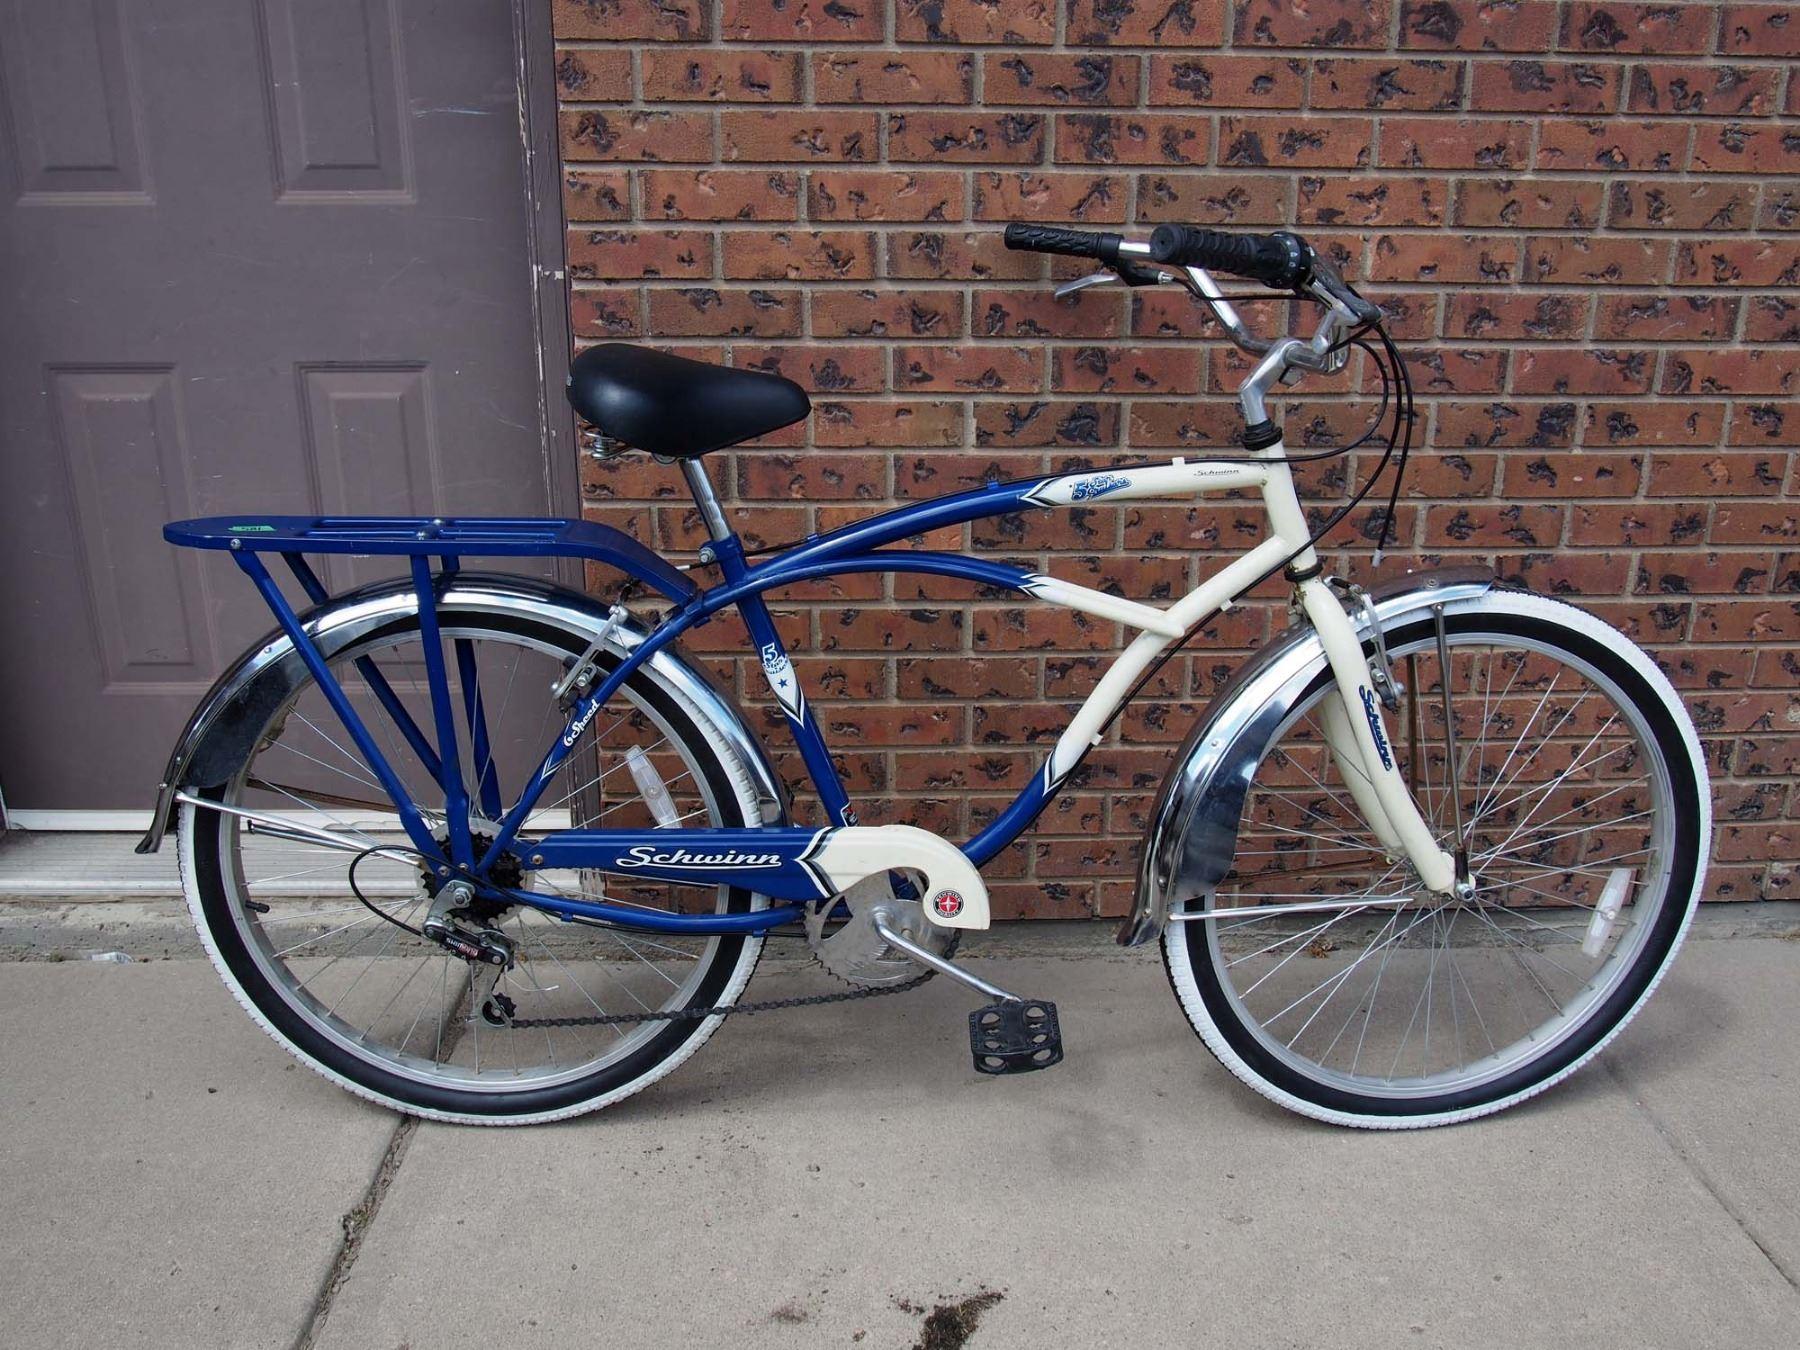 Schwinn Bicycle, 6 Speed 5 Star Cruiser- No Repairs Needed